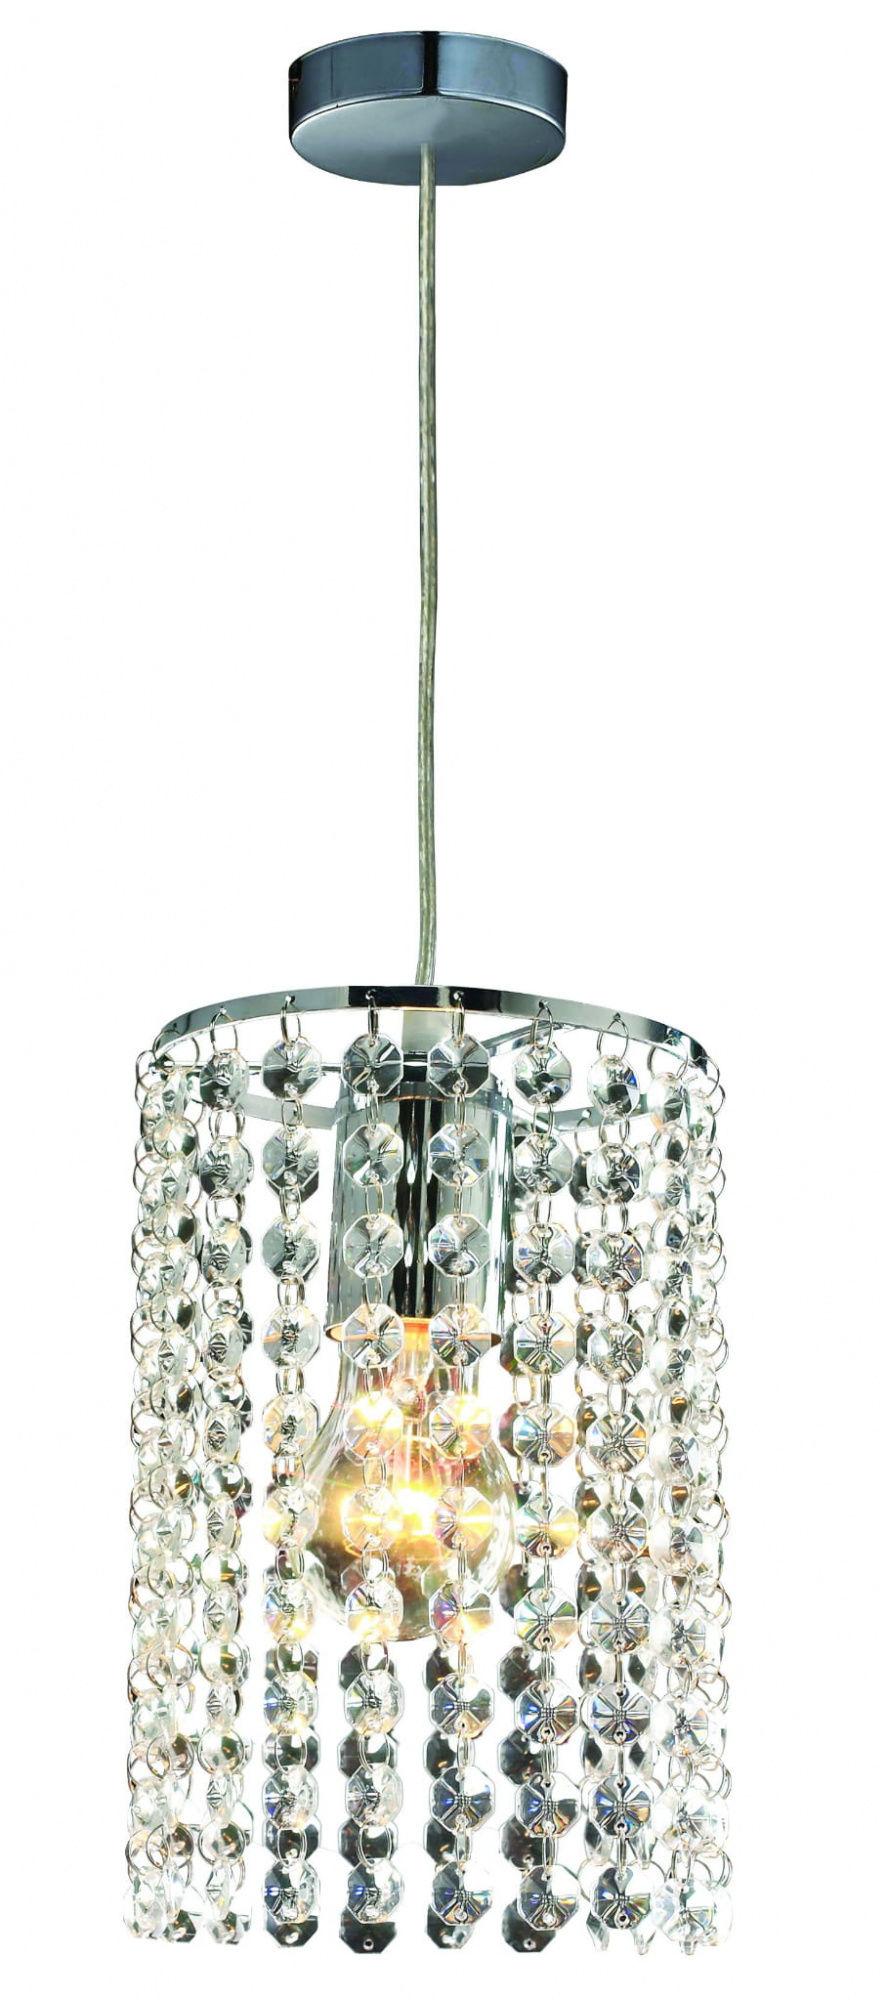 Lampa wisząca Bright Star LP-812/1P Light Prestige kryształowa oprawa w kolorze srebrnym